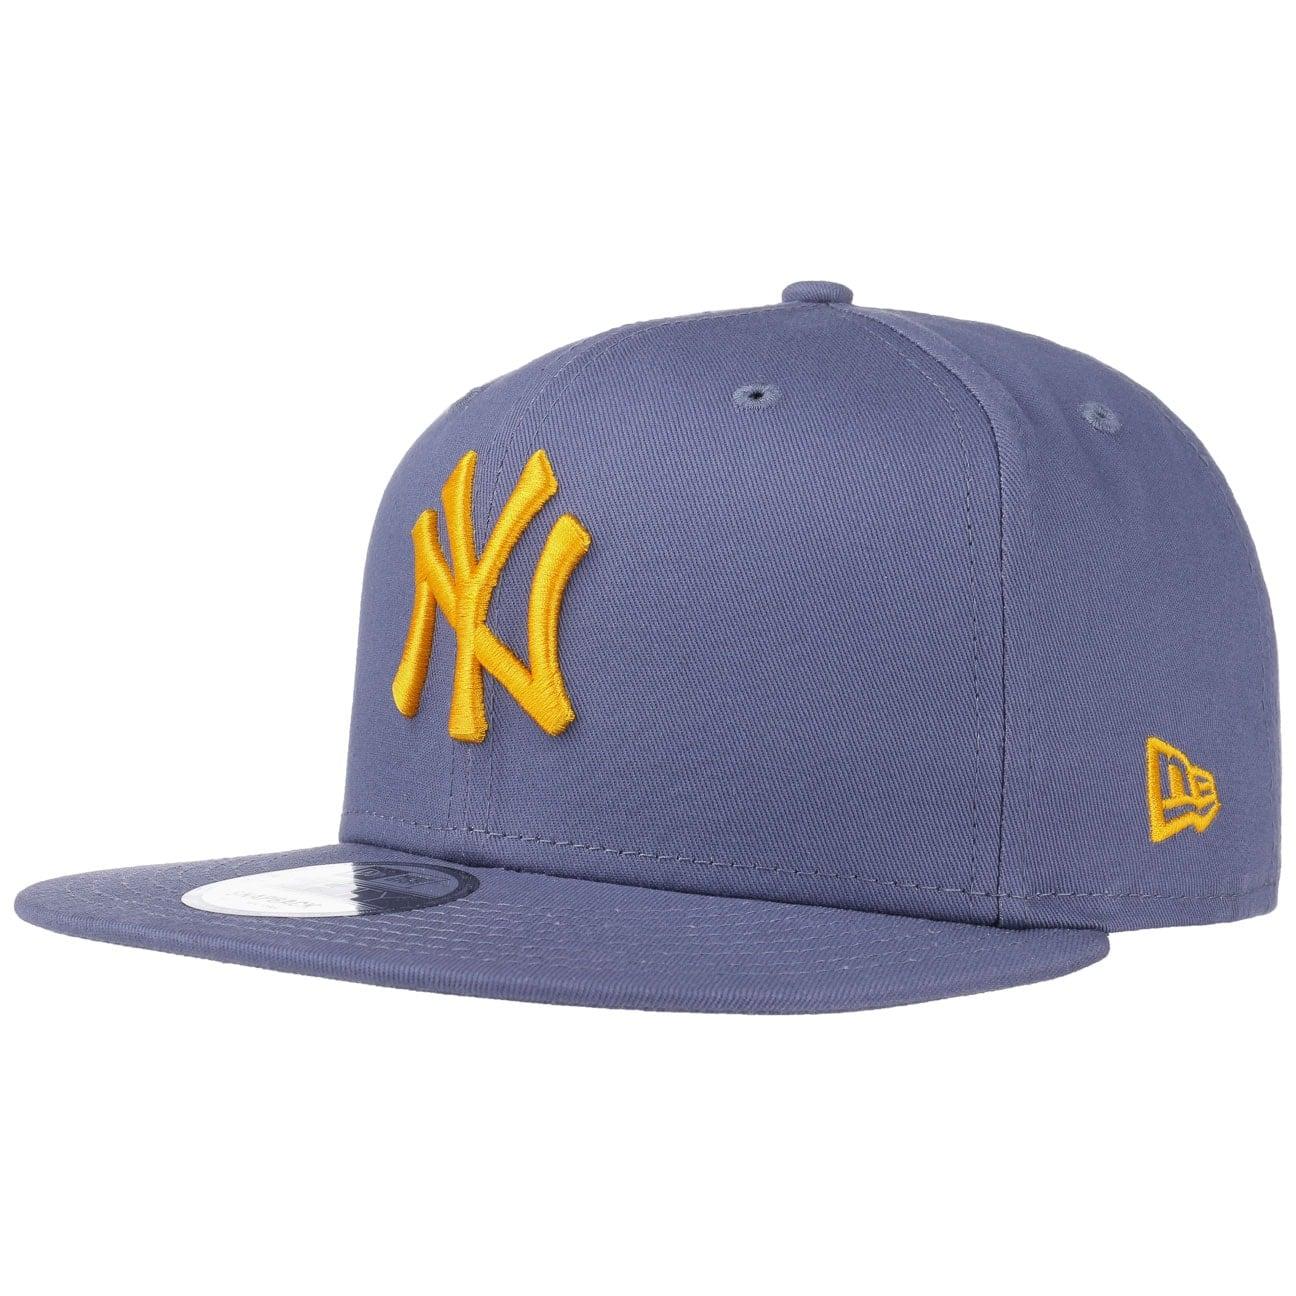 9fifty-league-ess-ny-yankees-cap-by-new-era-basecap